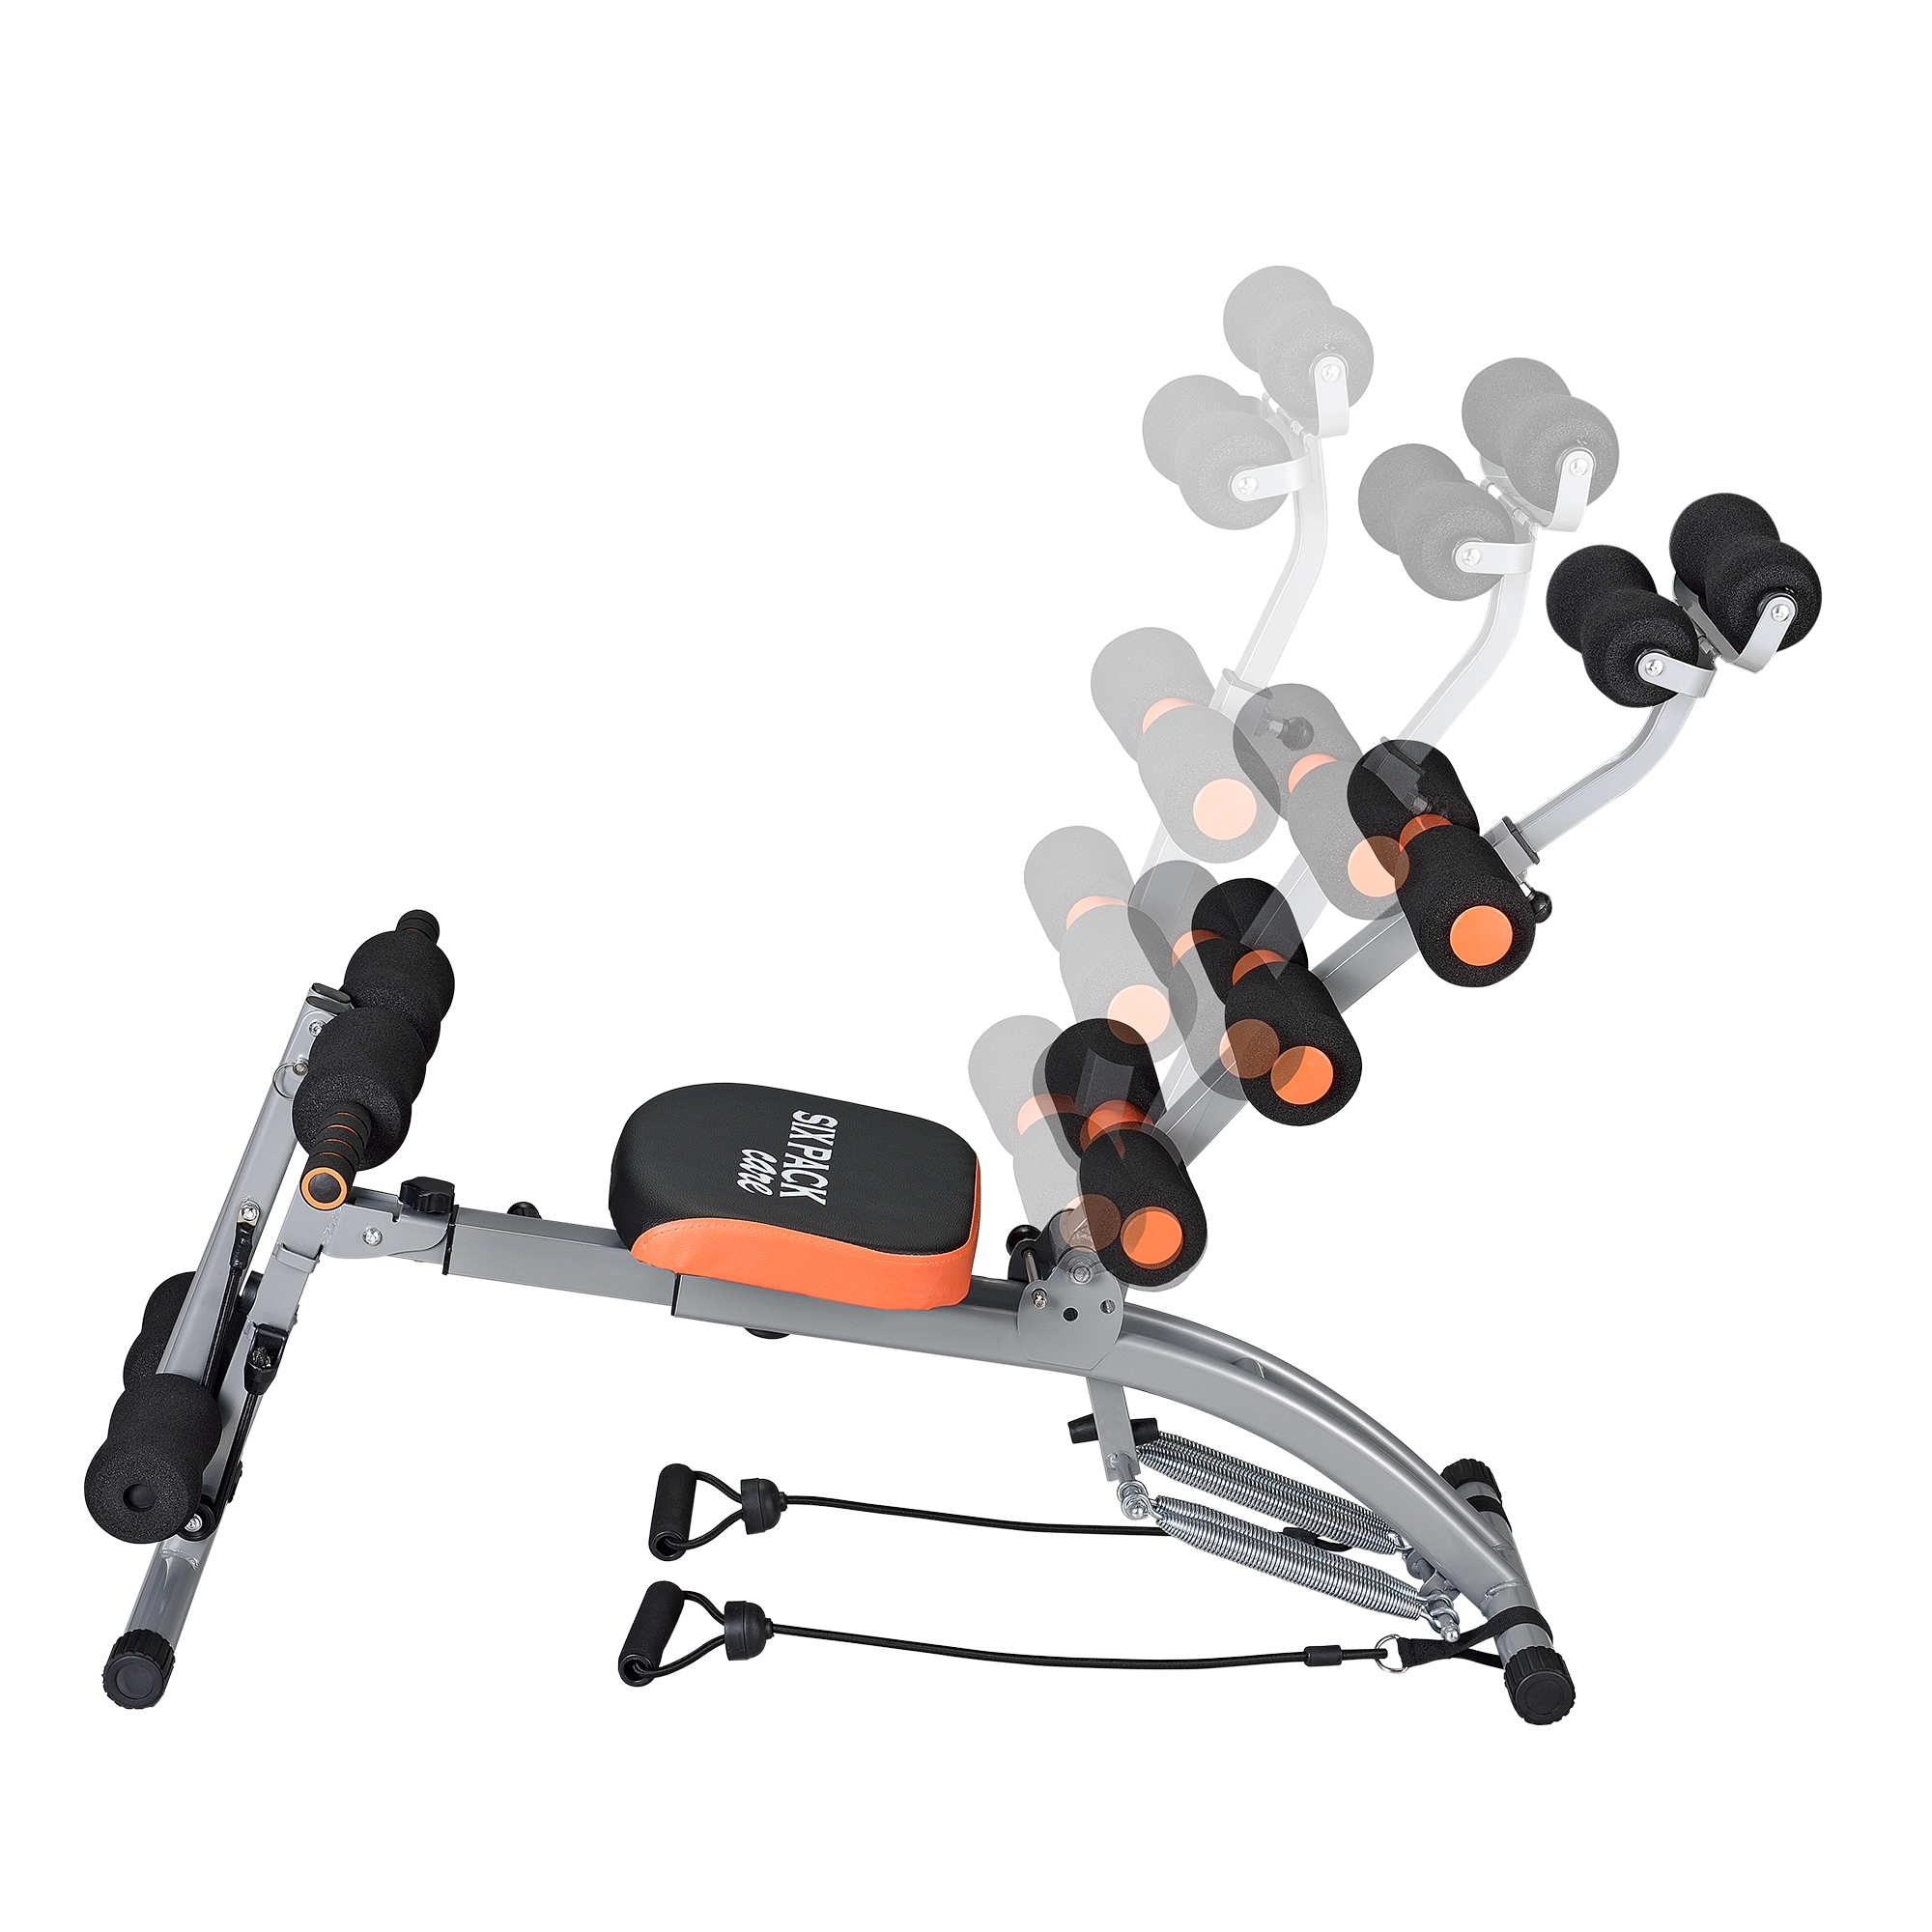 50x Exerciser Sport Gym Stimulator Bauchmuskeltrainer Trainingsgerät Elektro